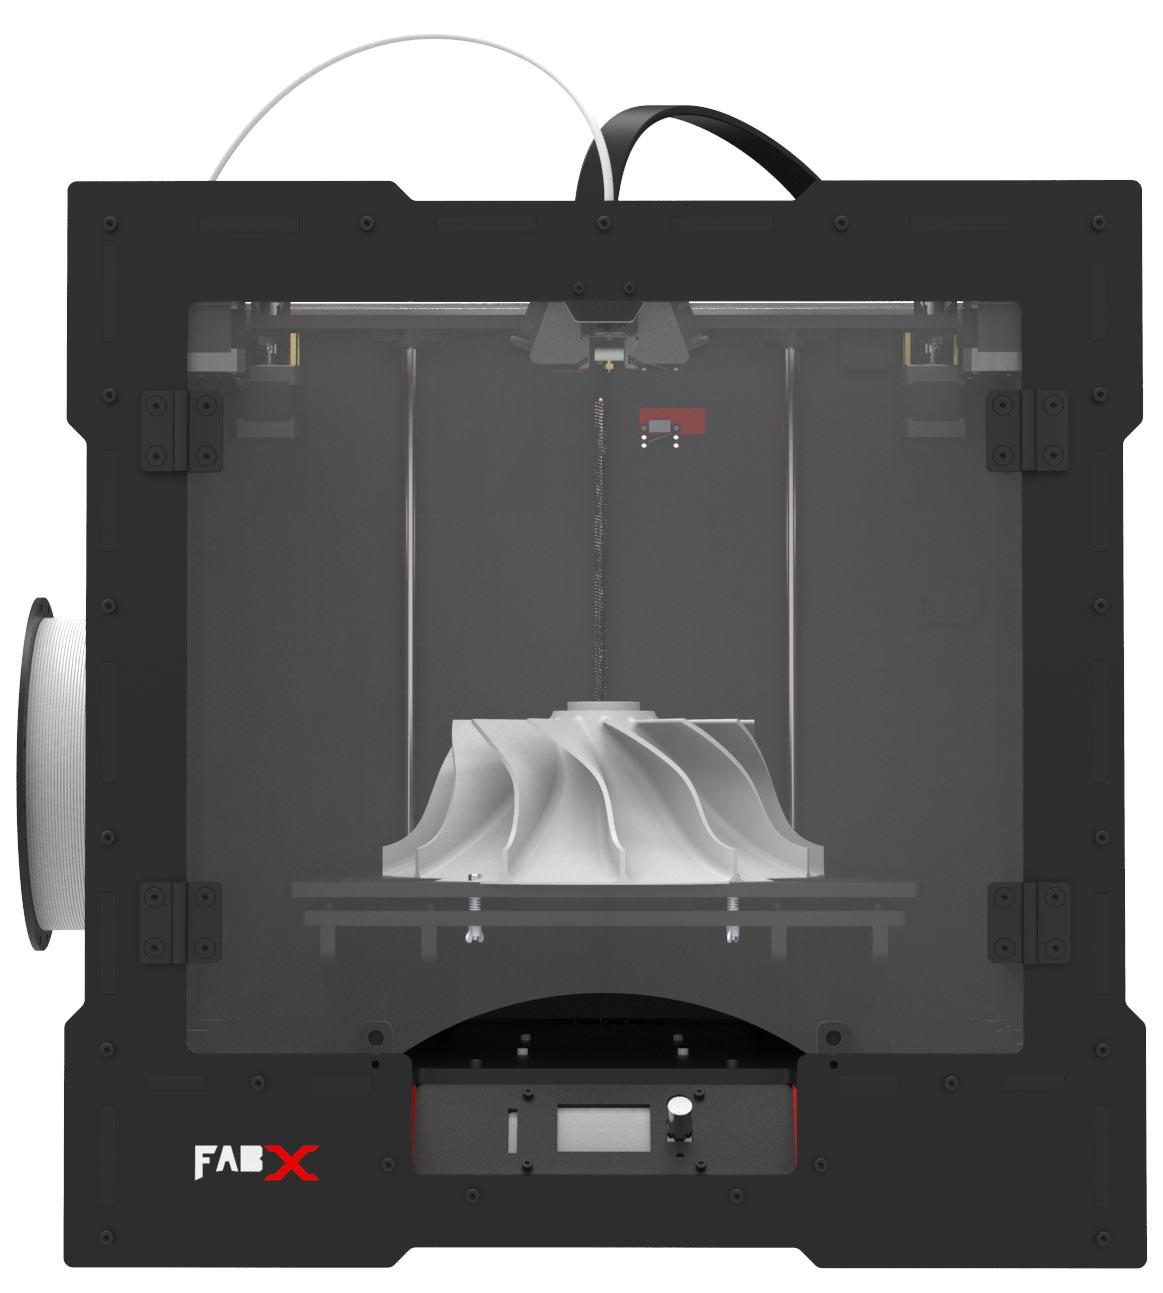 FabXL 3D Printer Automobiles